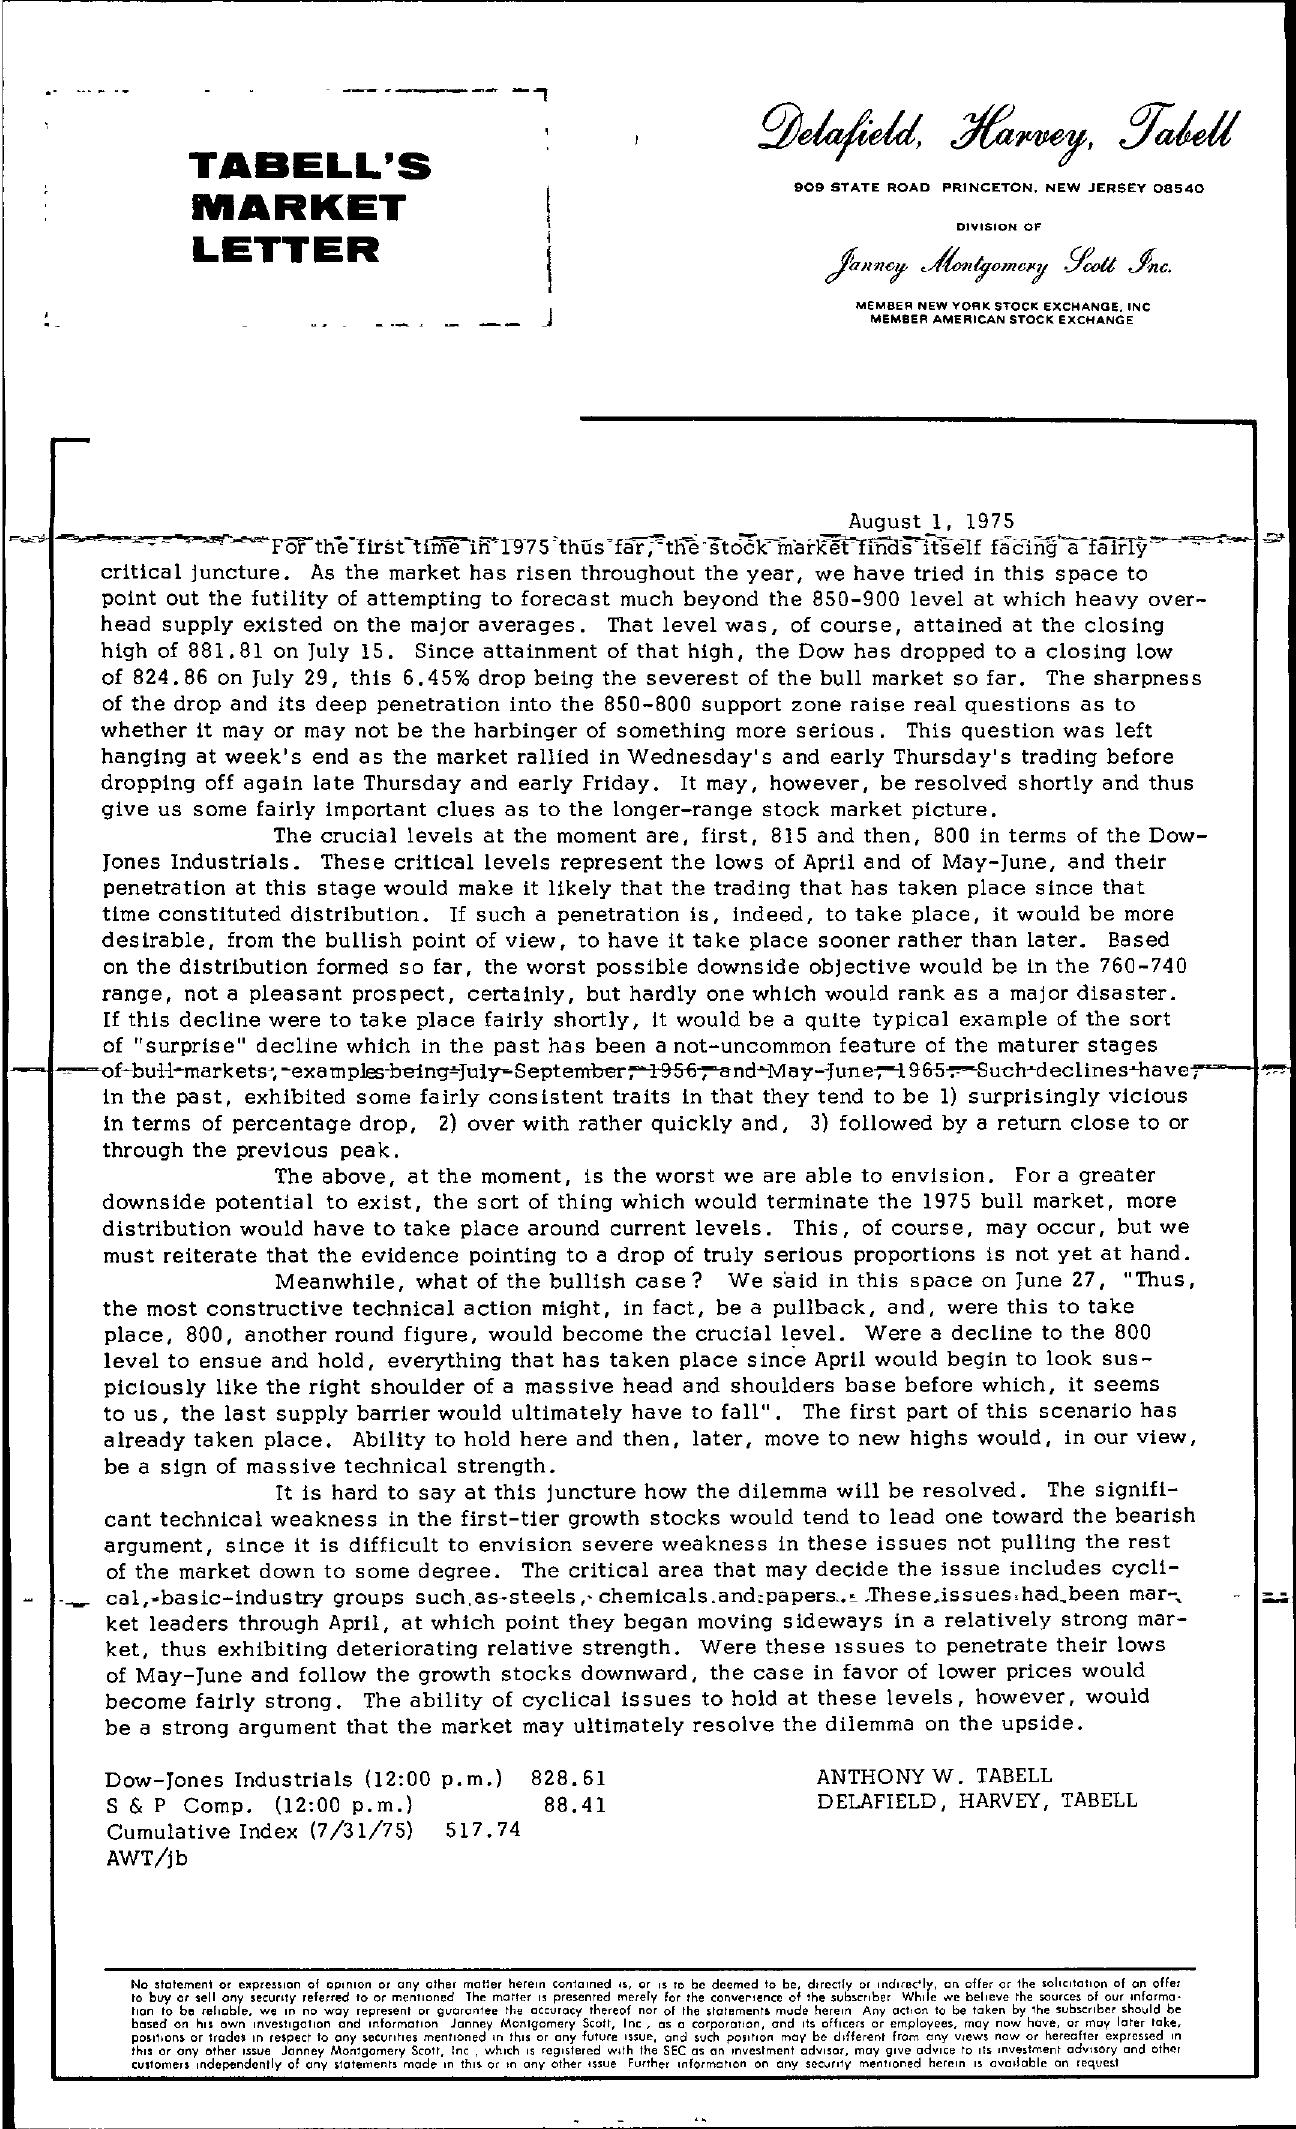 Tabell's Market Letter - August 01, 1975